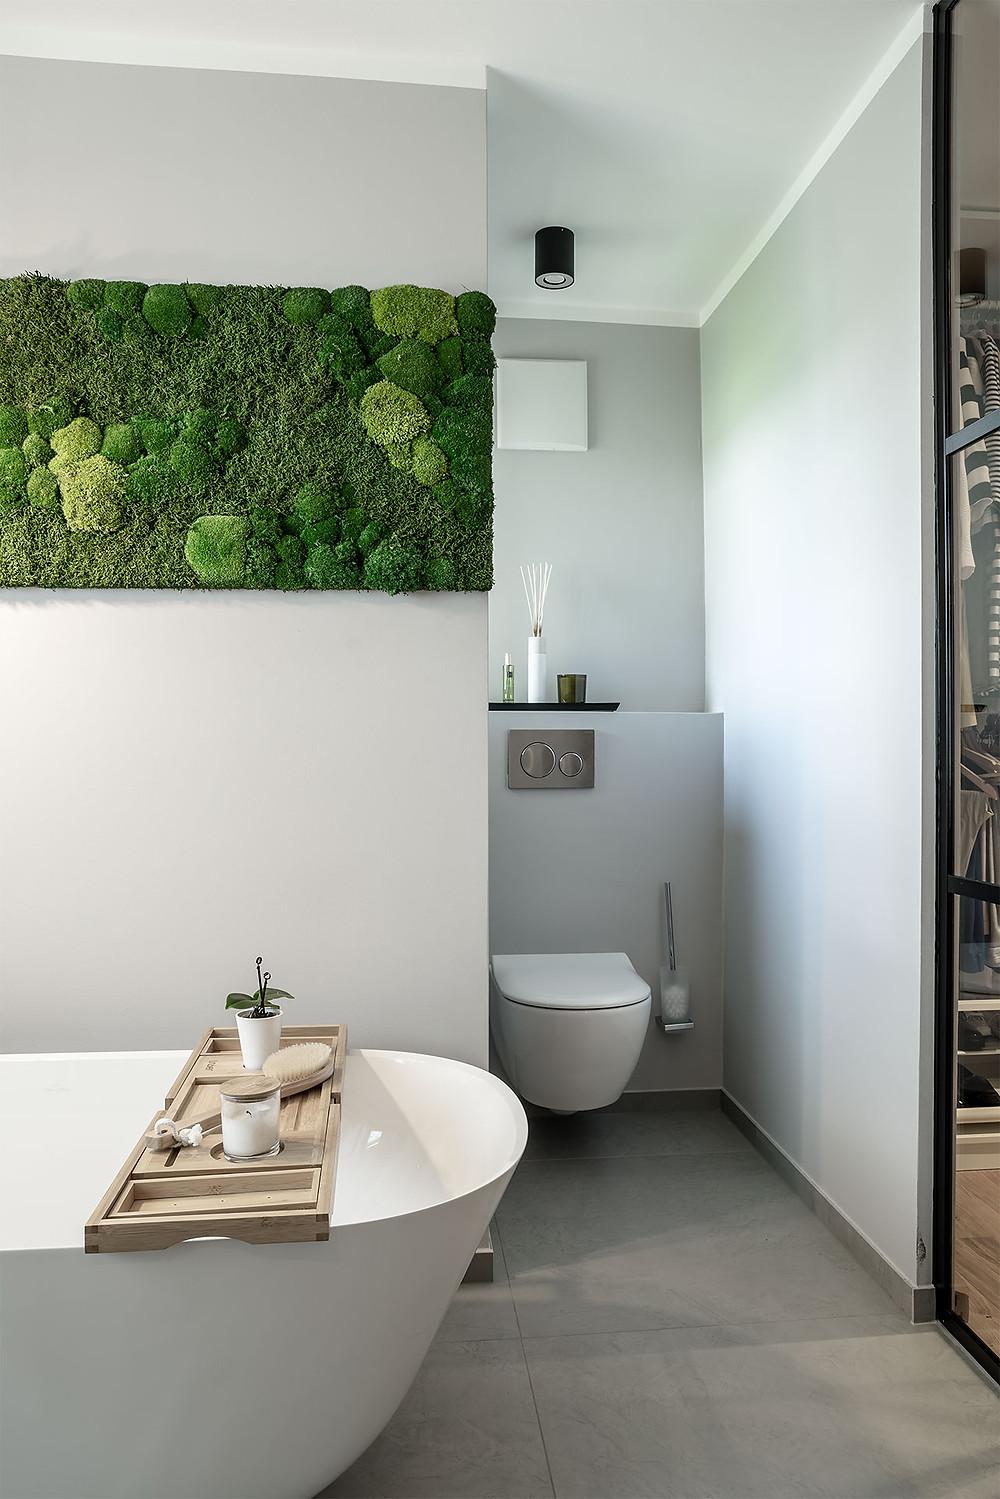 ME & ME Konzept & Design für Lebensräume